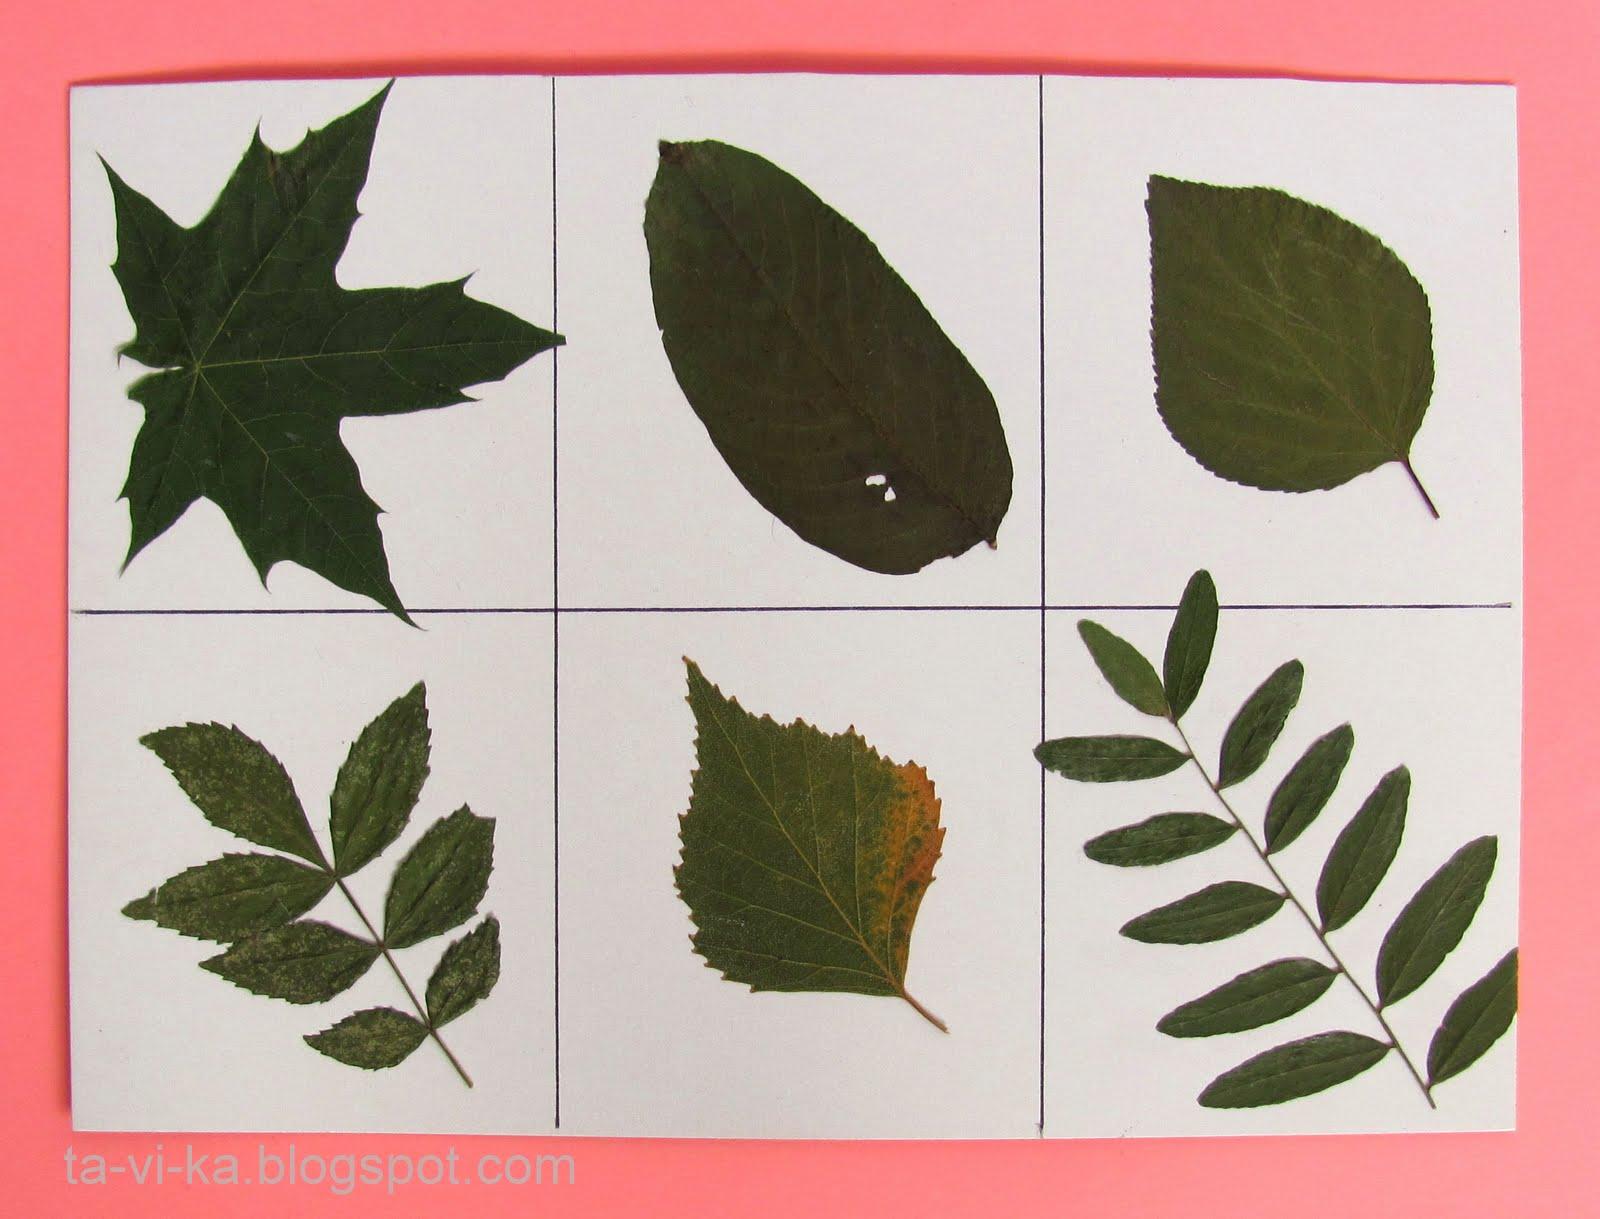 картинки листиков деревьев